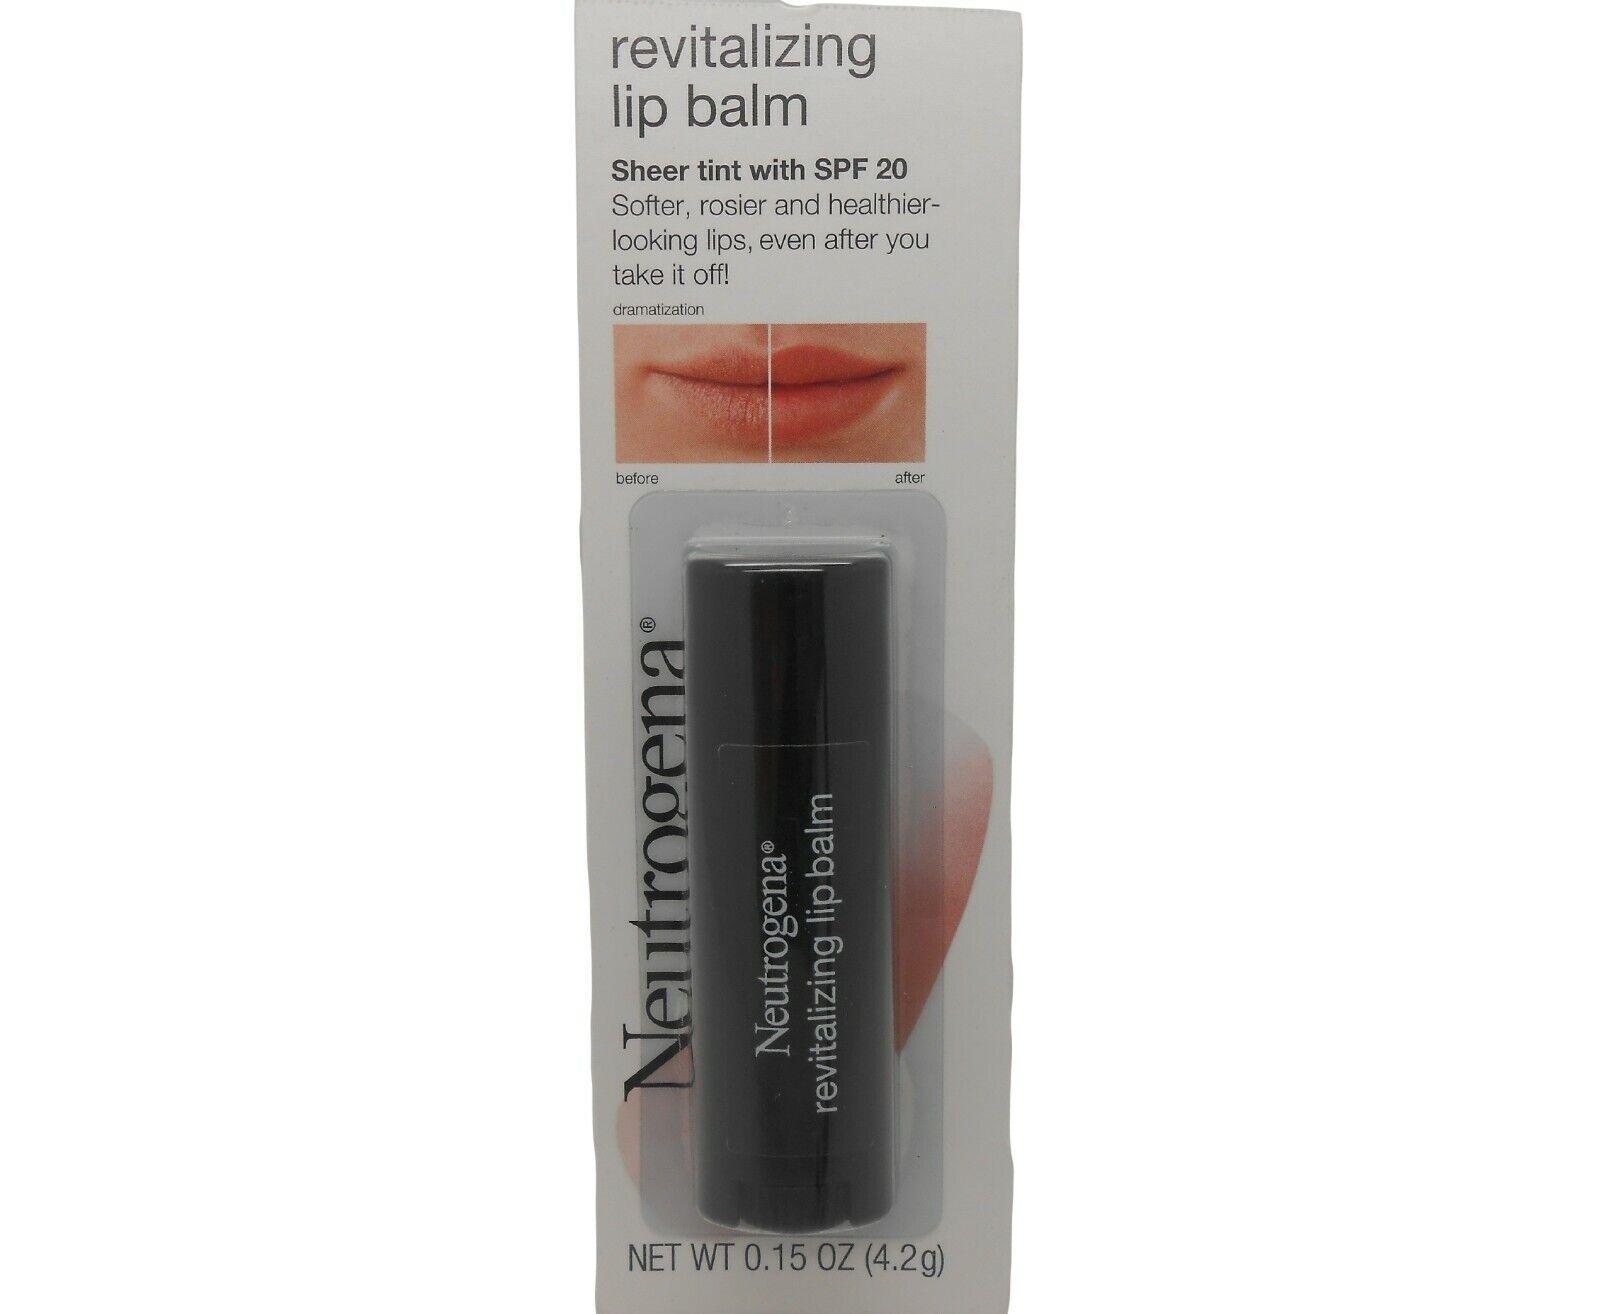 Neutrogena Revitalizing Lip Balm Spf 20, Petal Glow 40, .15